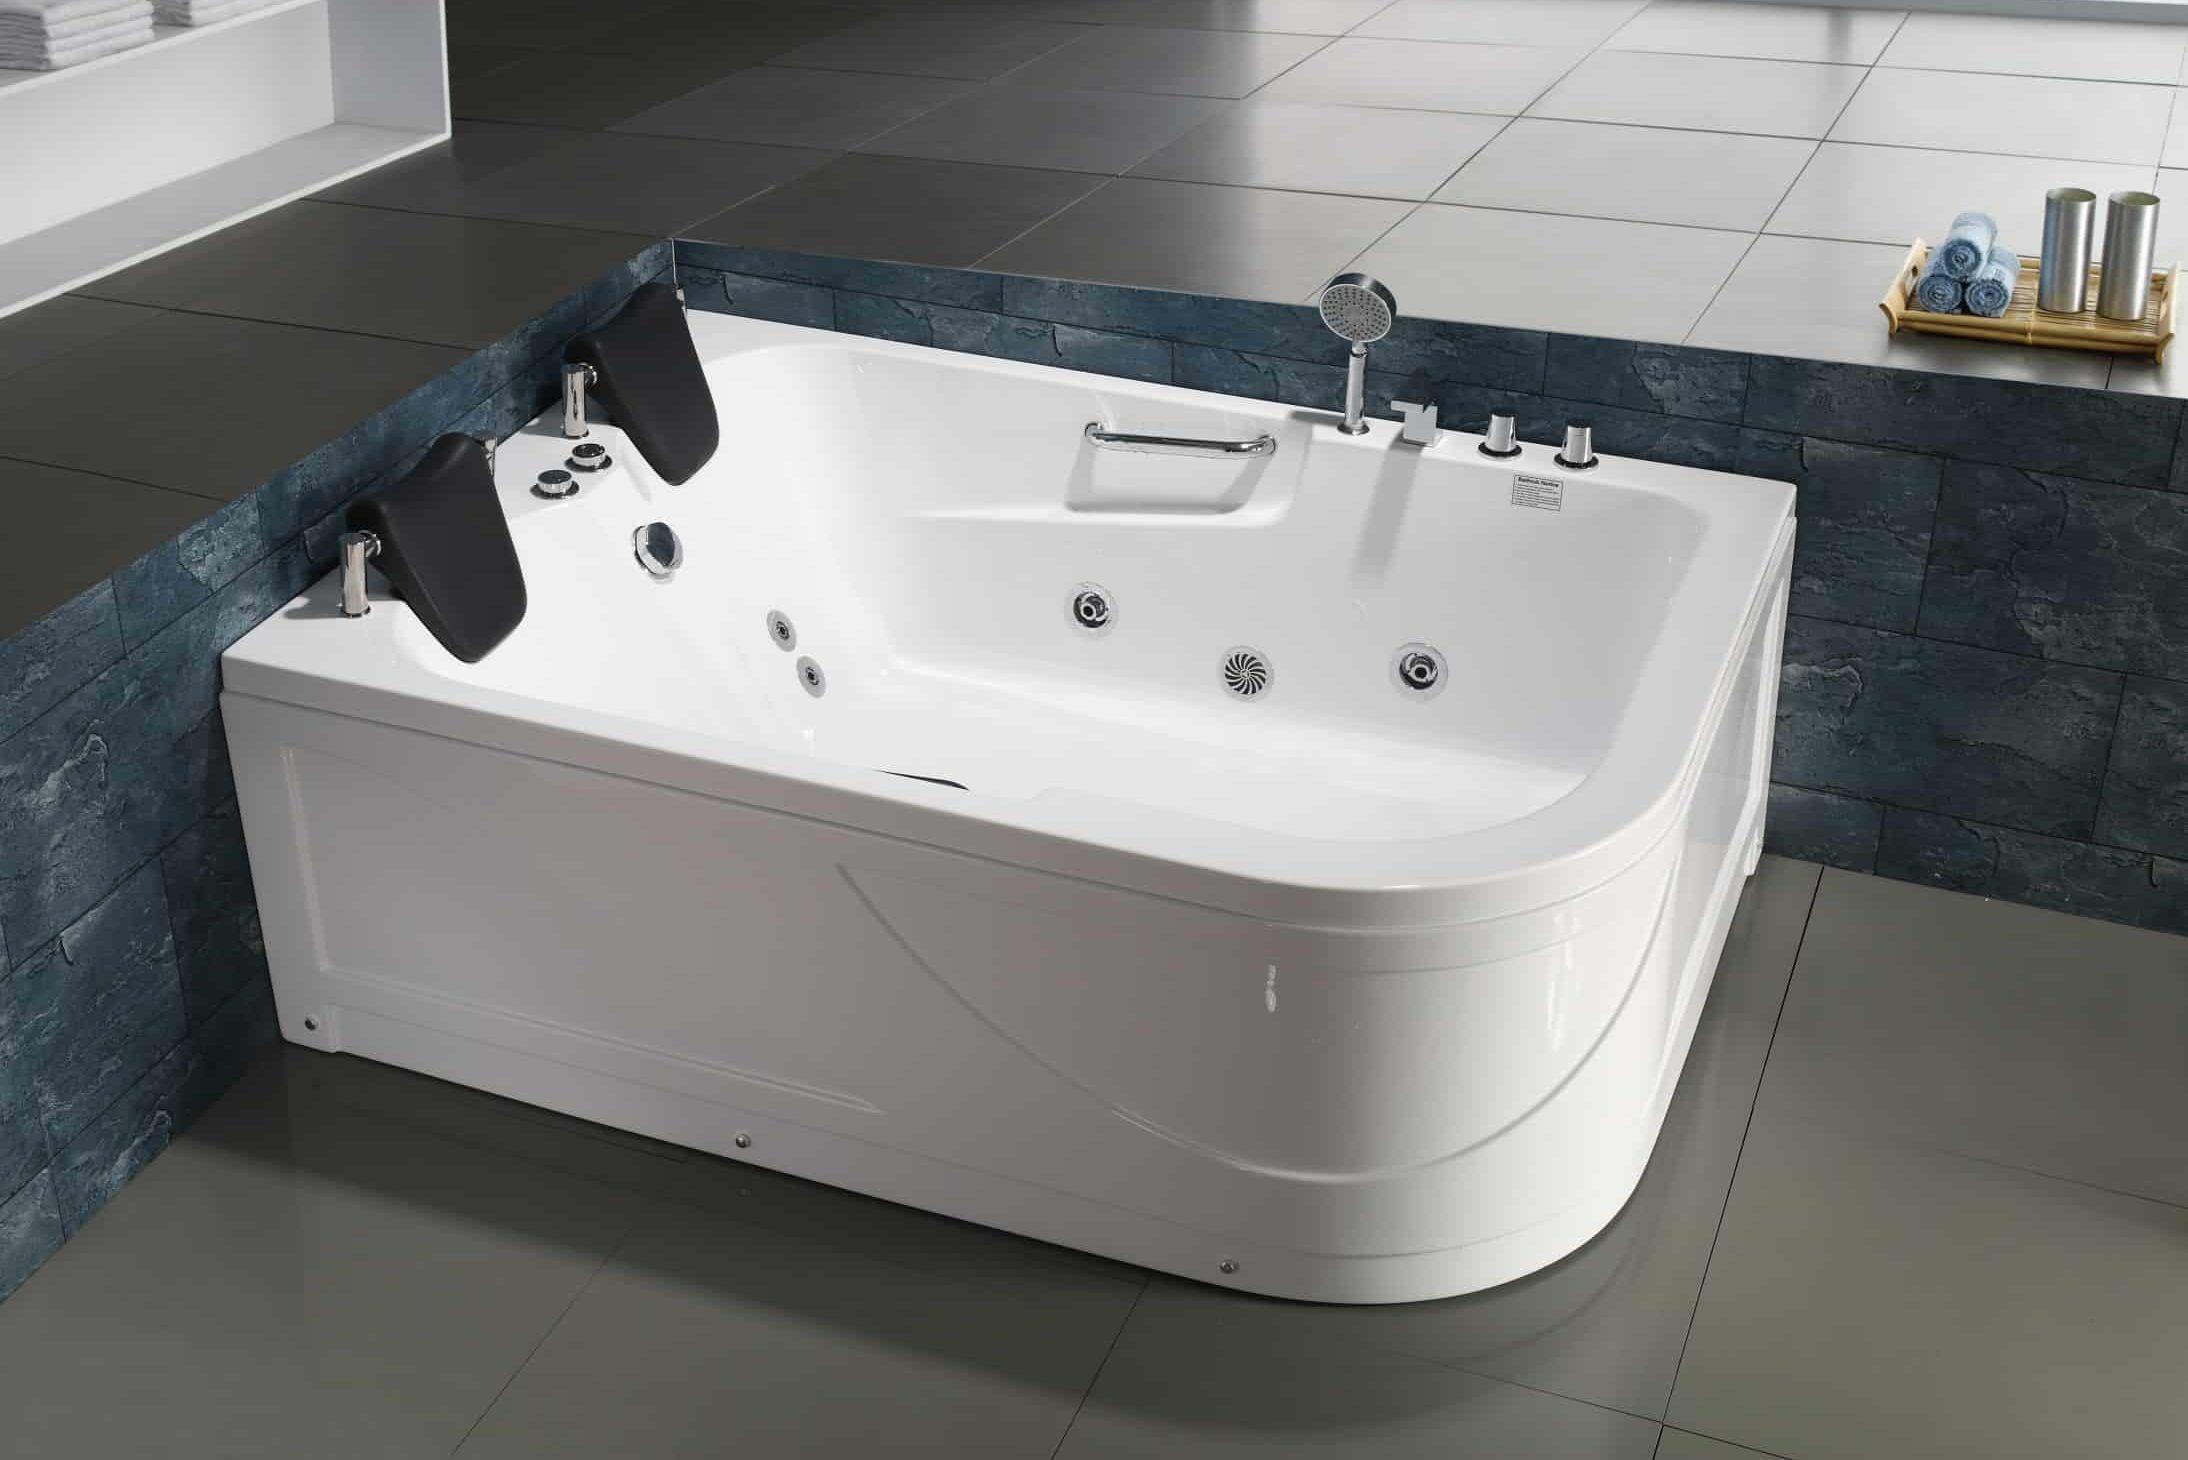 Sorrento Bath room view